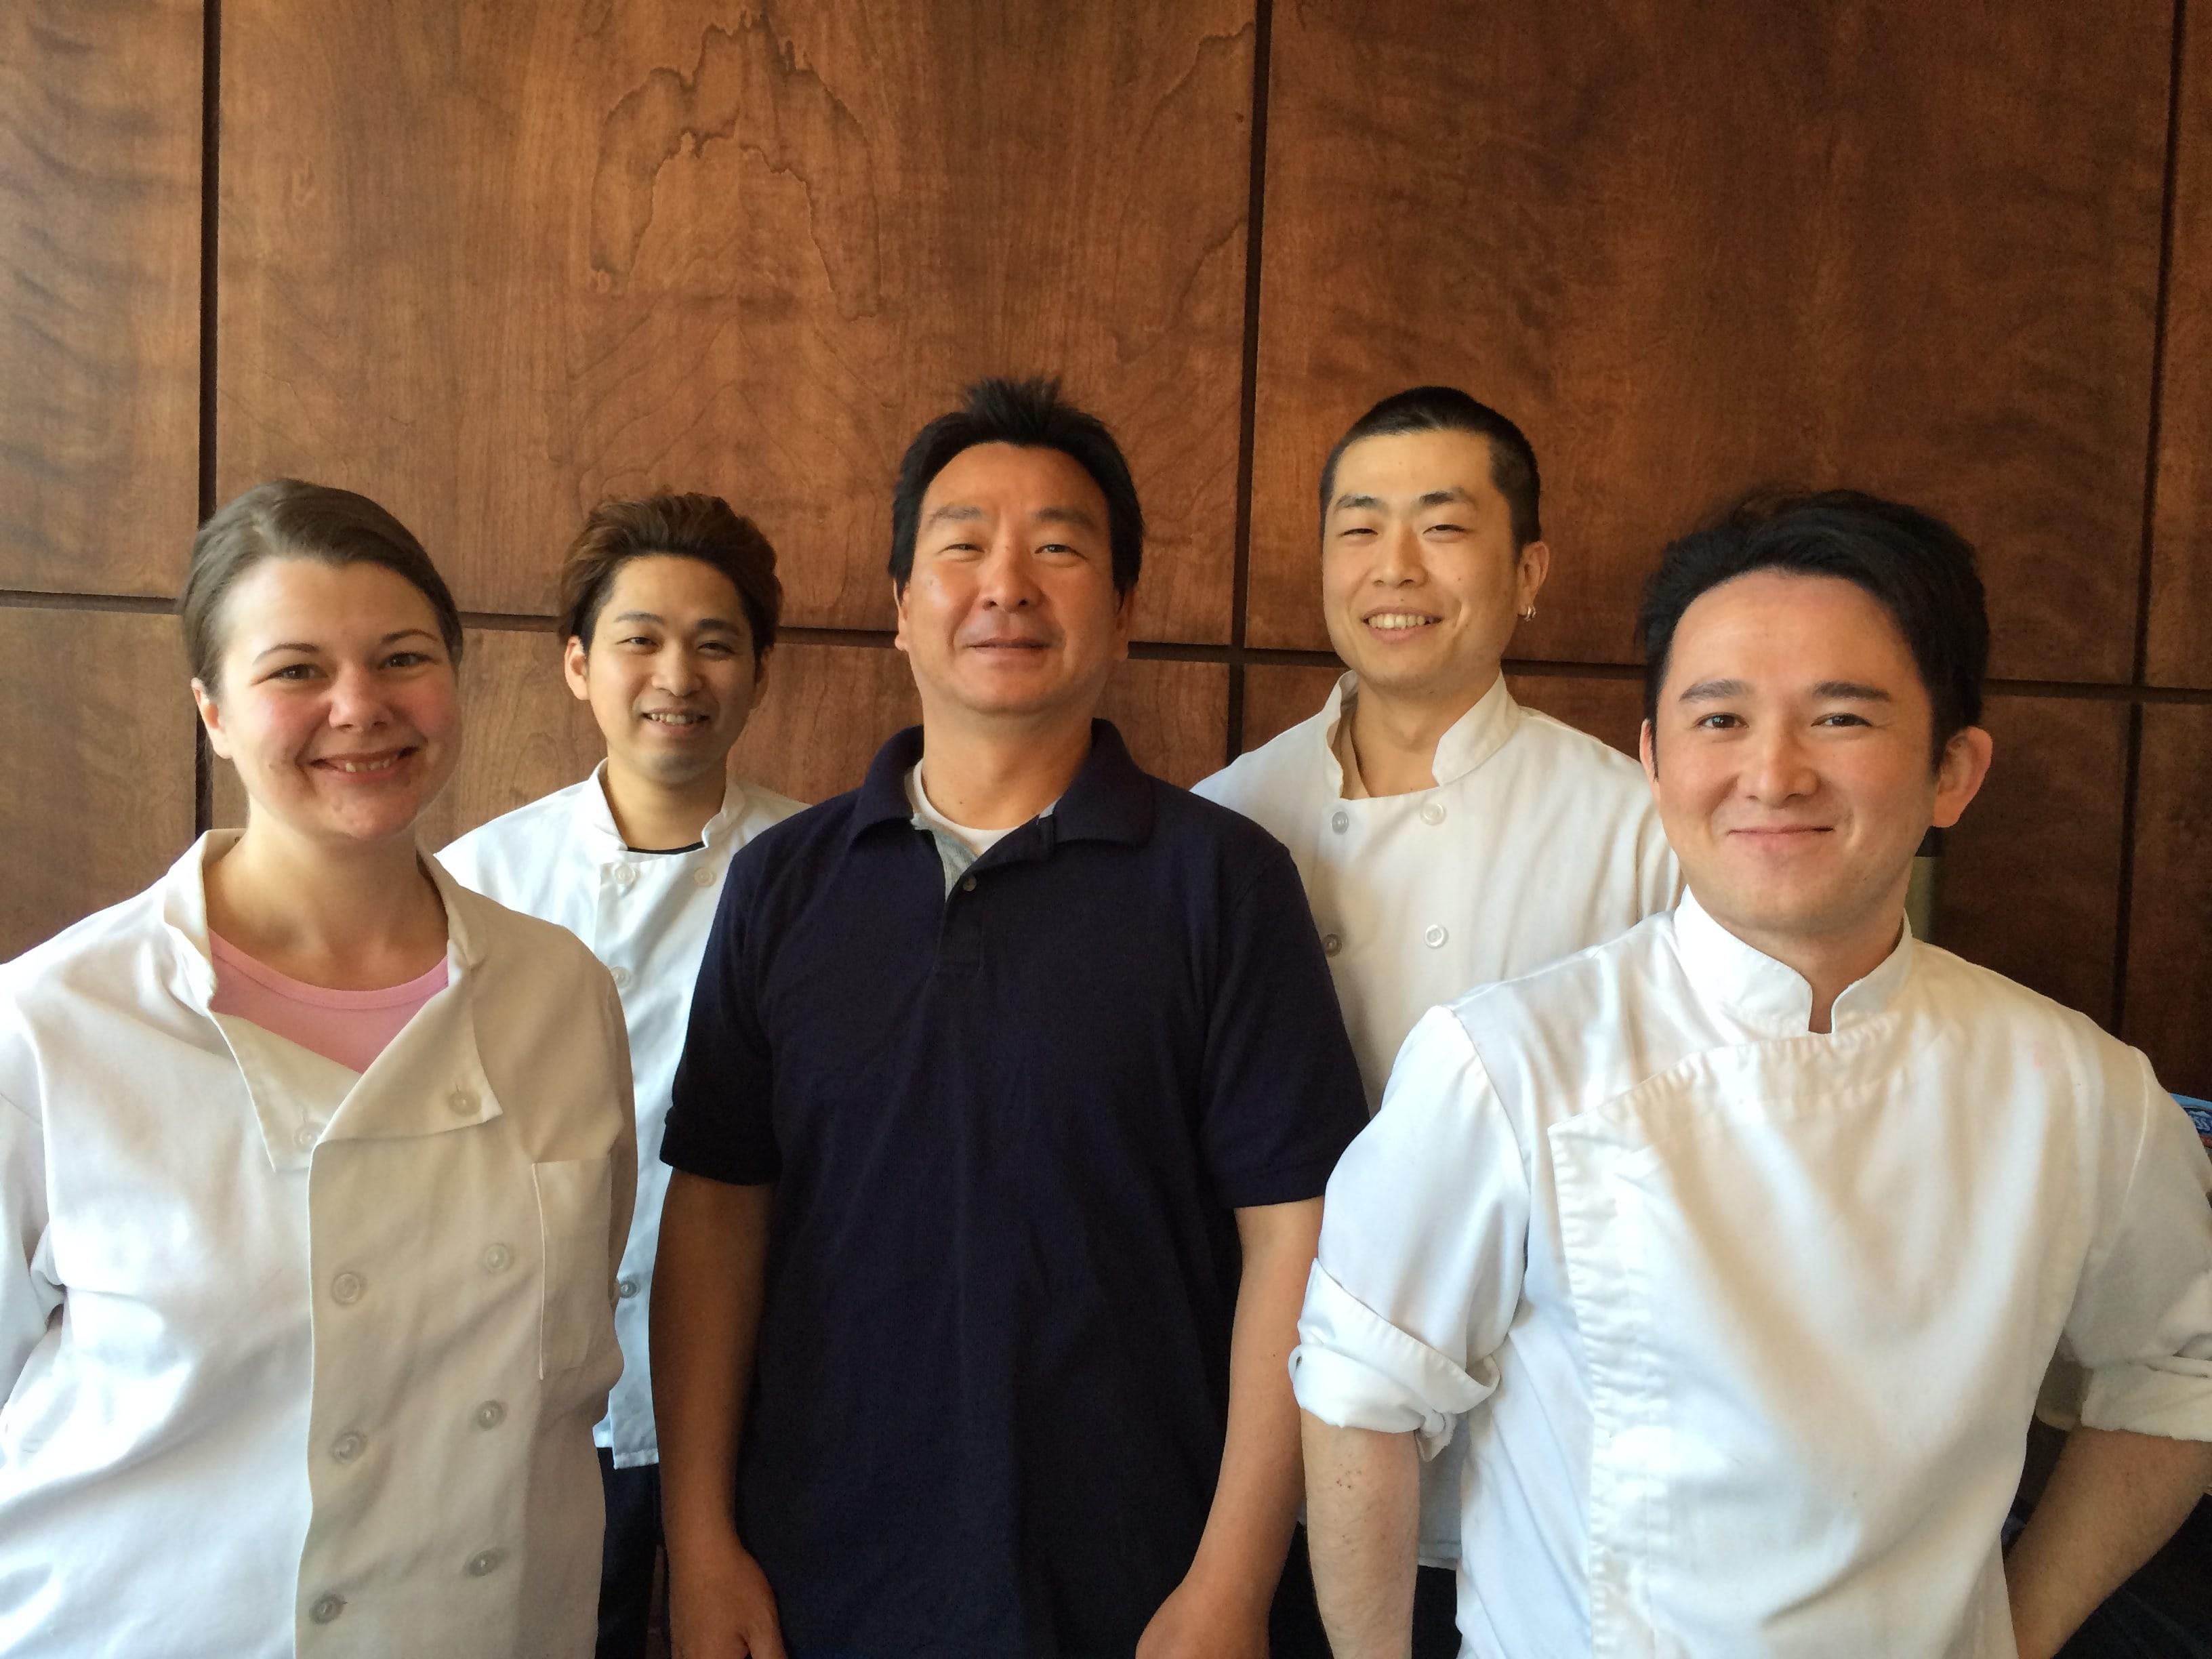 Left to right: Amanda Burchett (head chef and bakery manager), Takanobu Ogisu (head of breads), Akihiro Nakamura (owner), Koji Masuda (sales and helped translate for Ogisu), Yushi Osawa (head of pastries). • Courtesy Photo